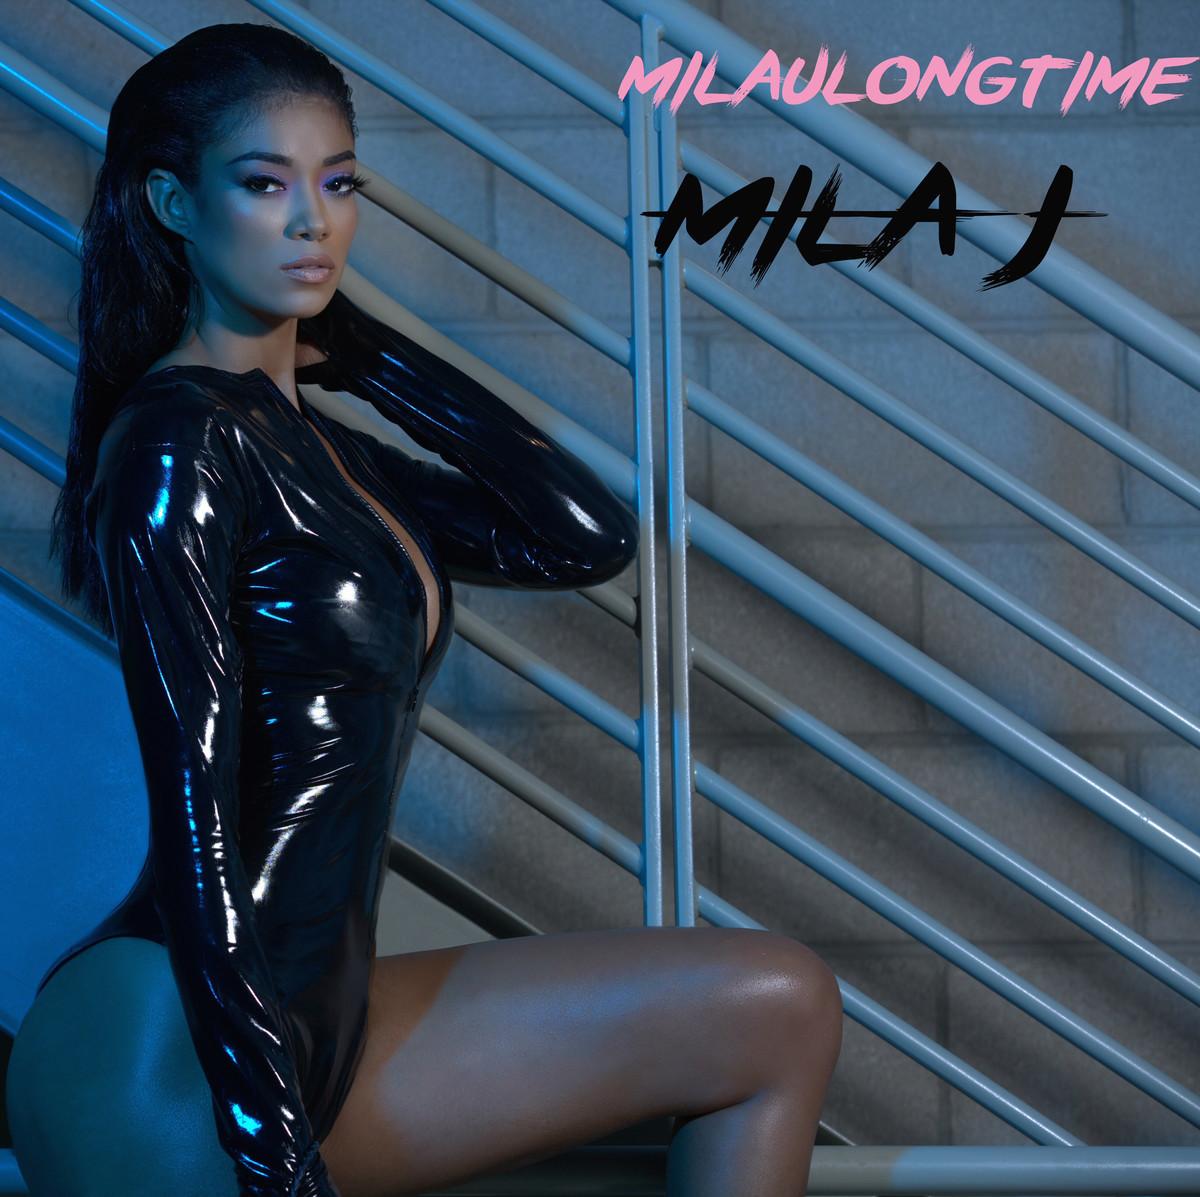 MILAULONGTIME Album Review